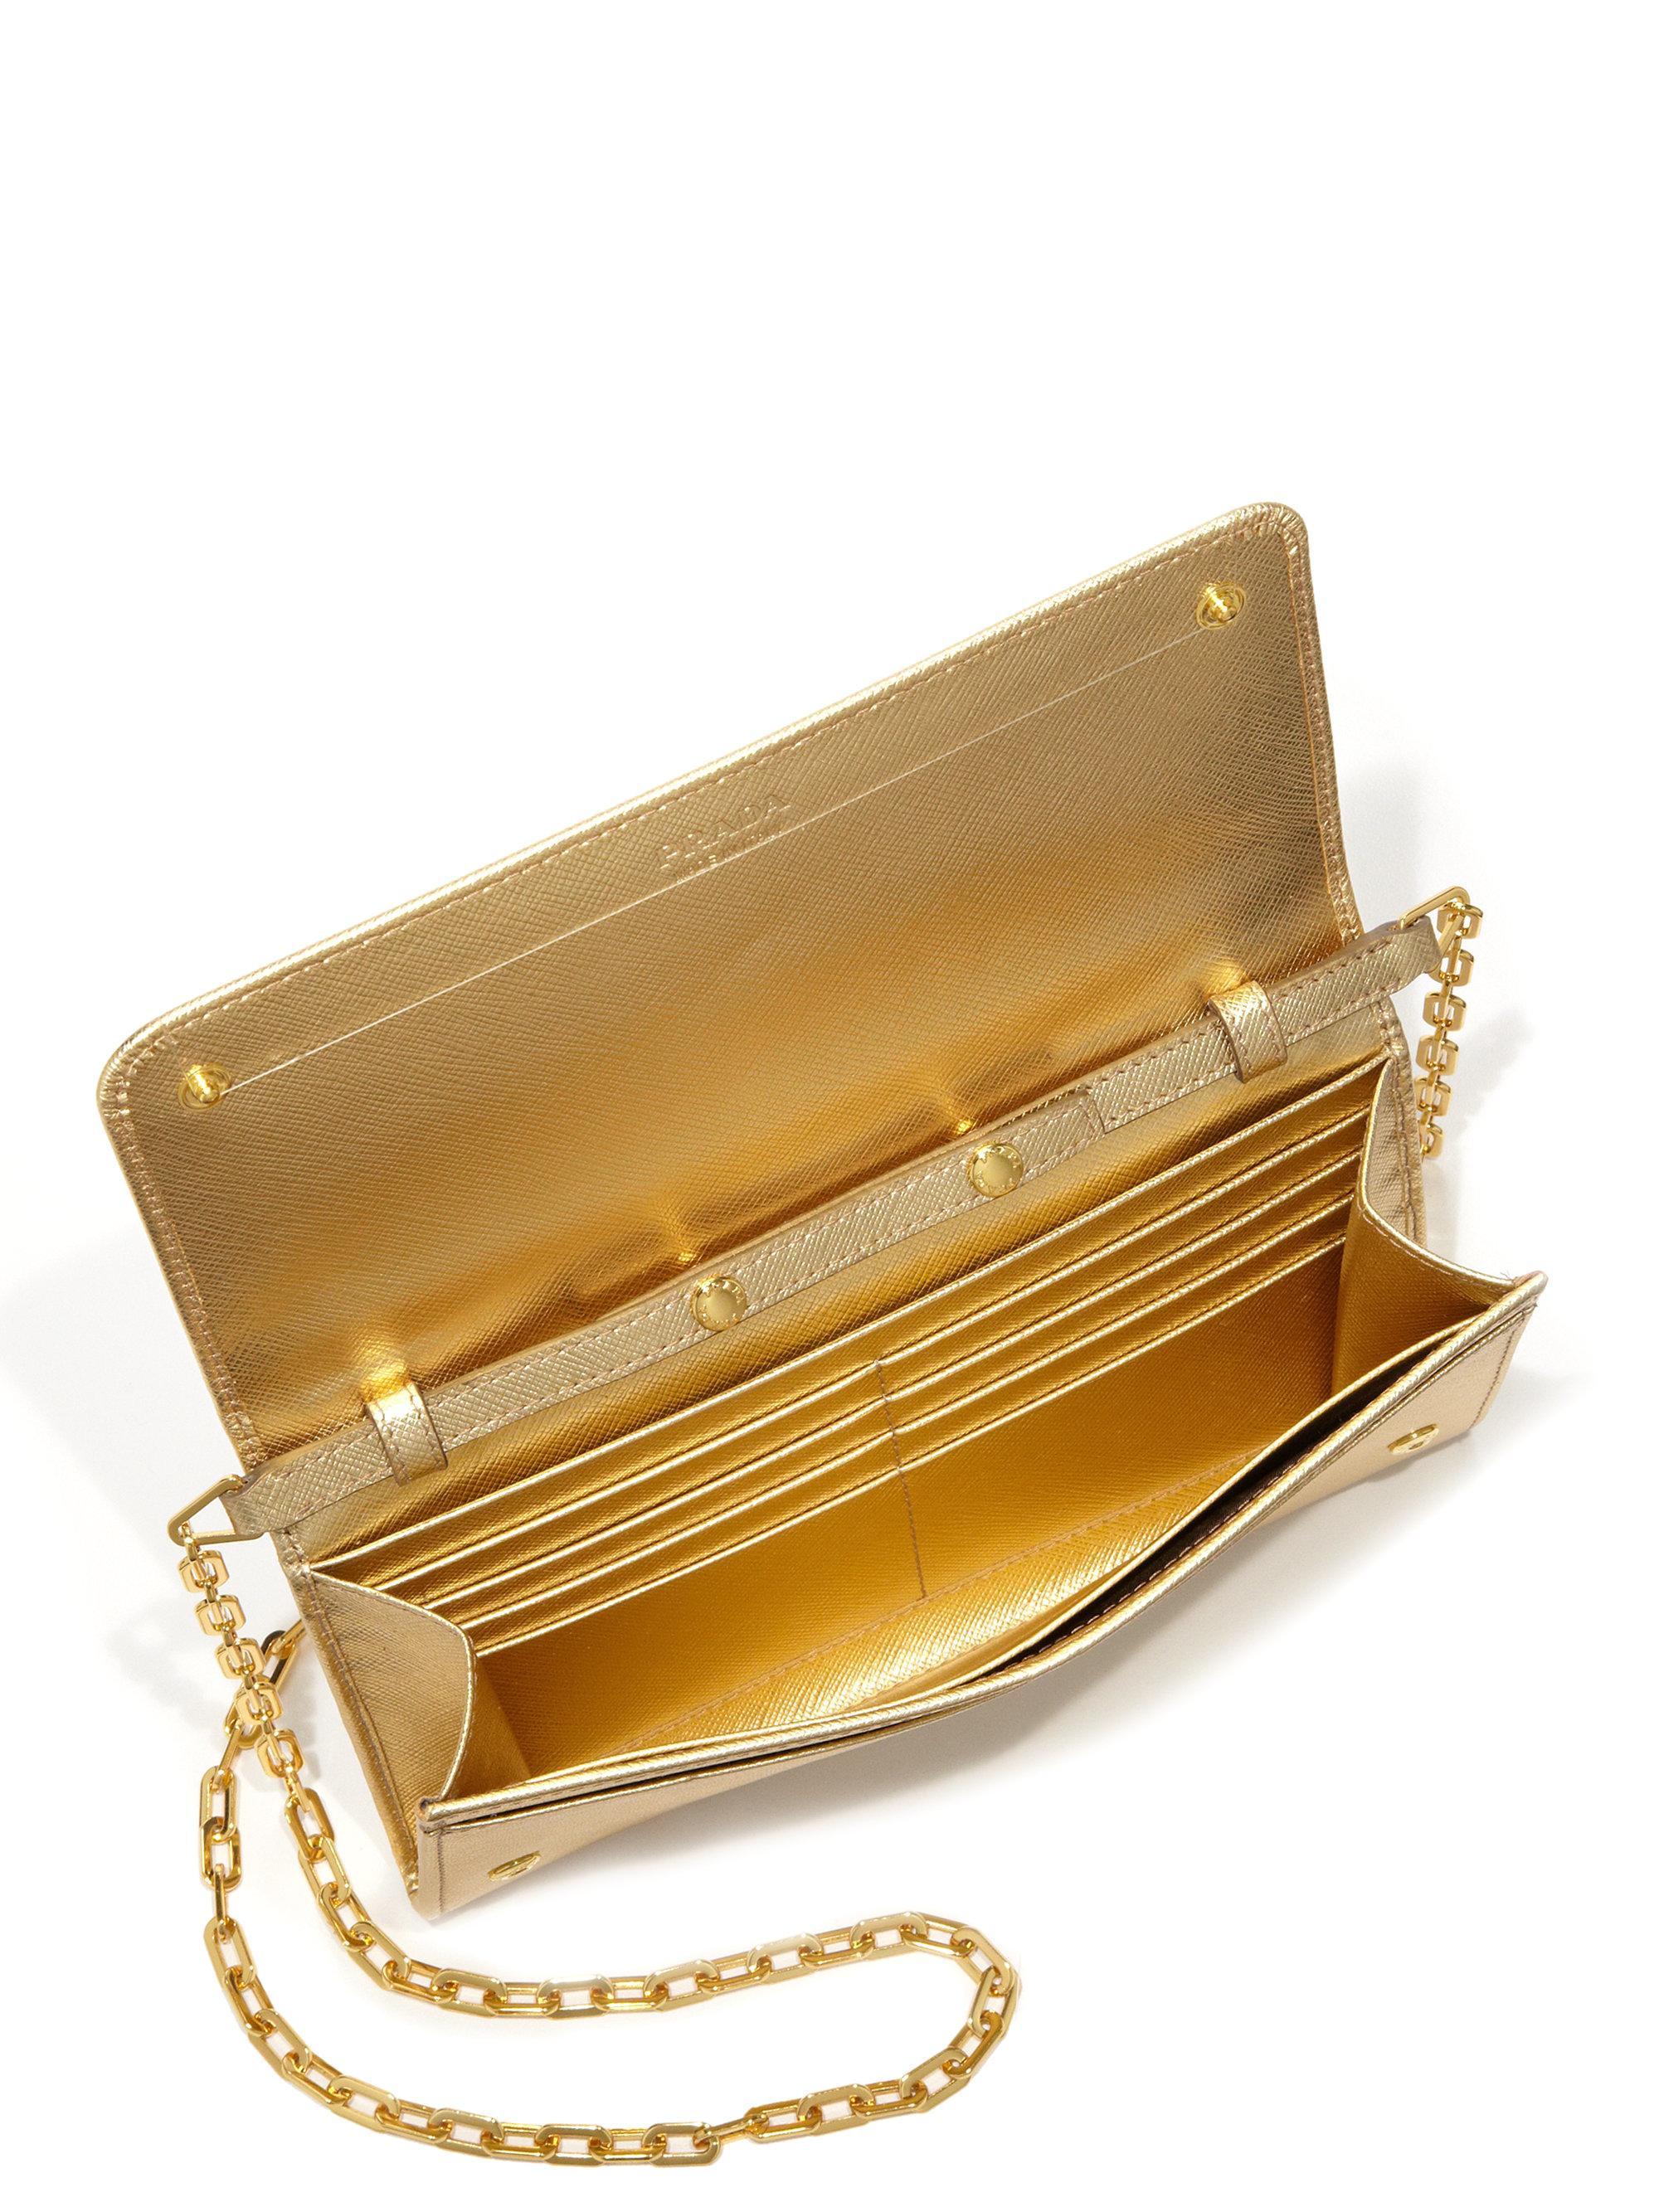 prada yellow leather wallet